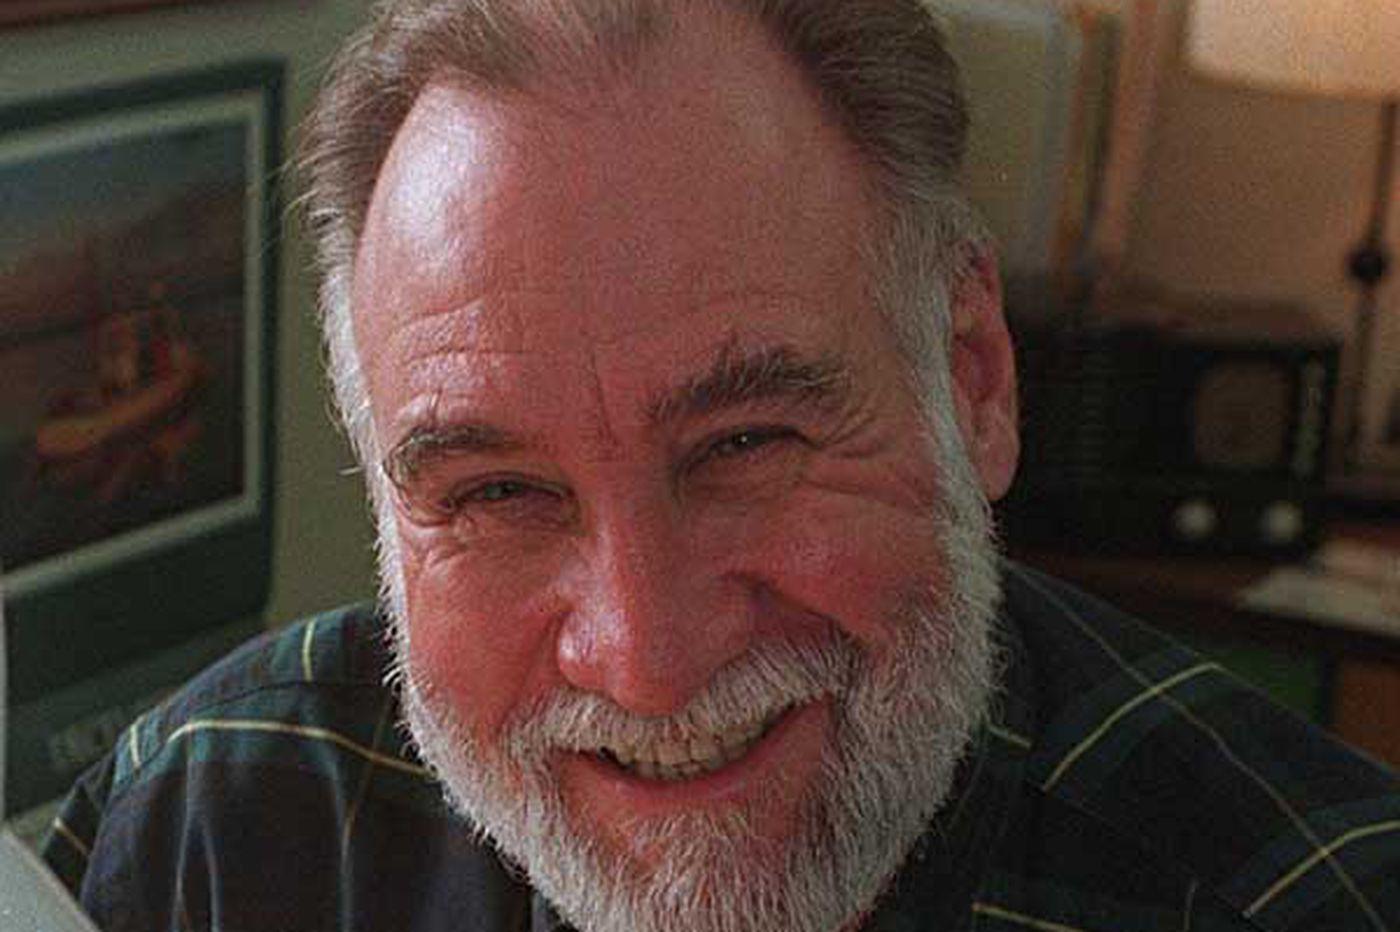 Tony Auth, 72, Pulitzer Prize-winning cartoonist, died Sunday